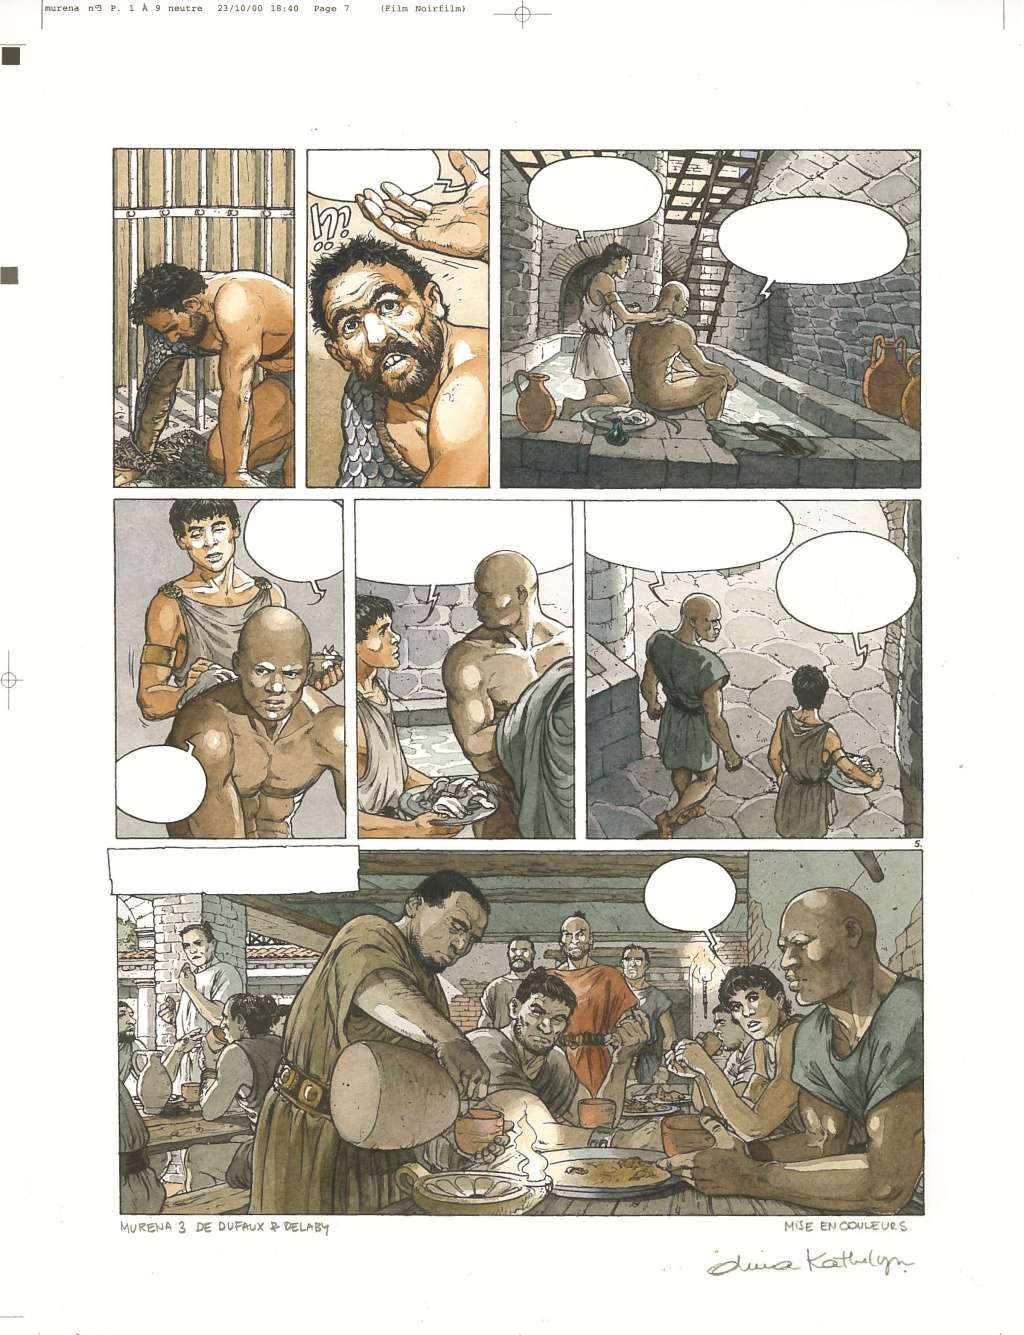 Murena a t-il remplacé Alix ? - Page 6 Delaby14